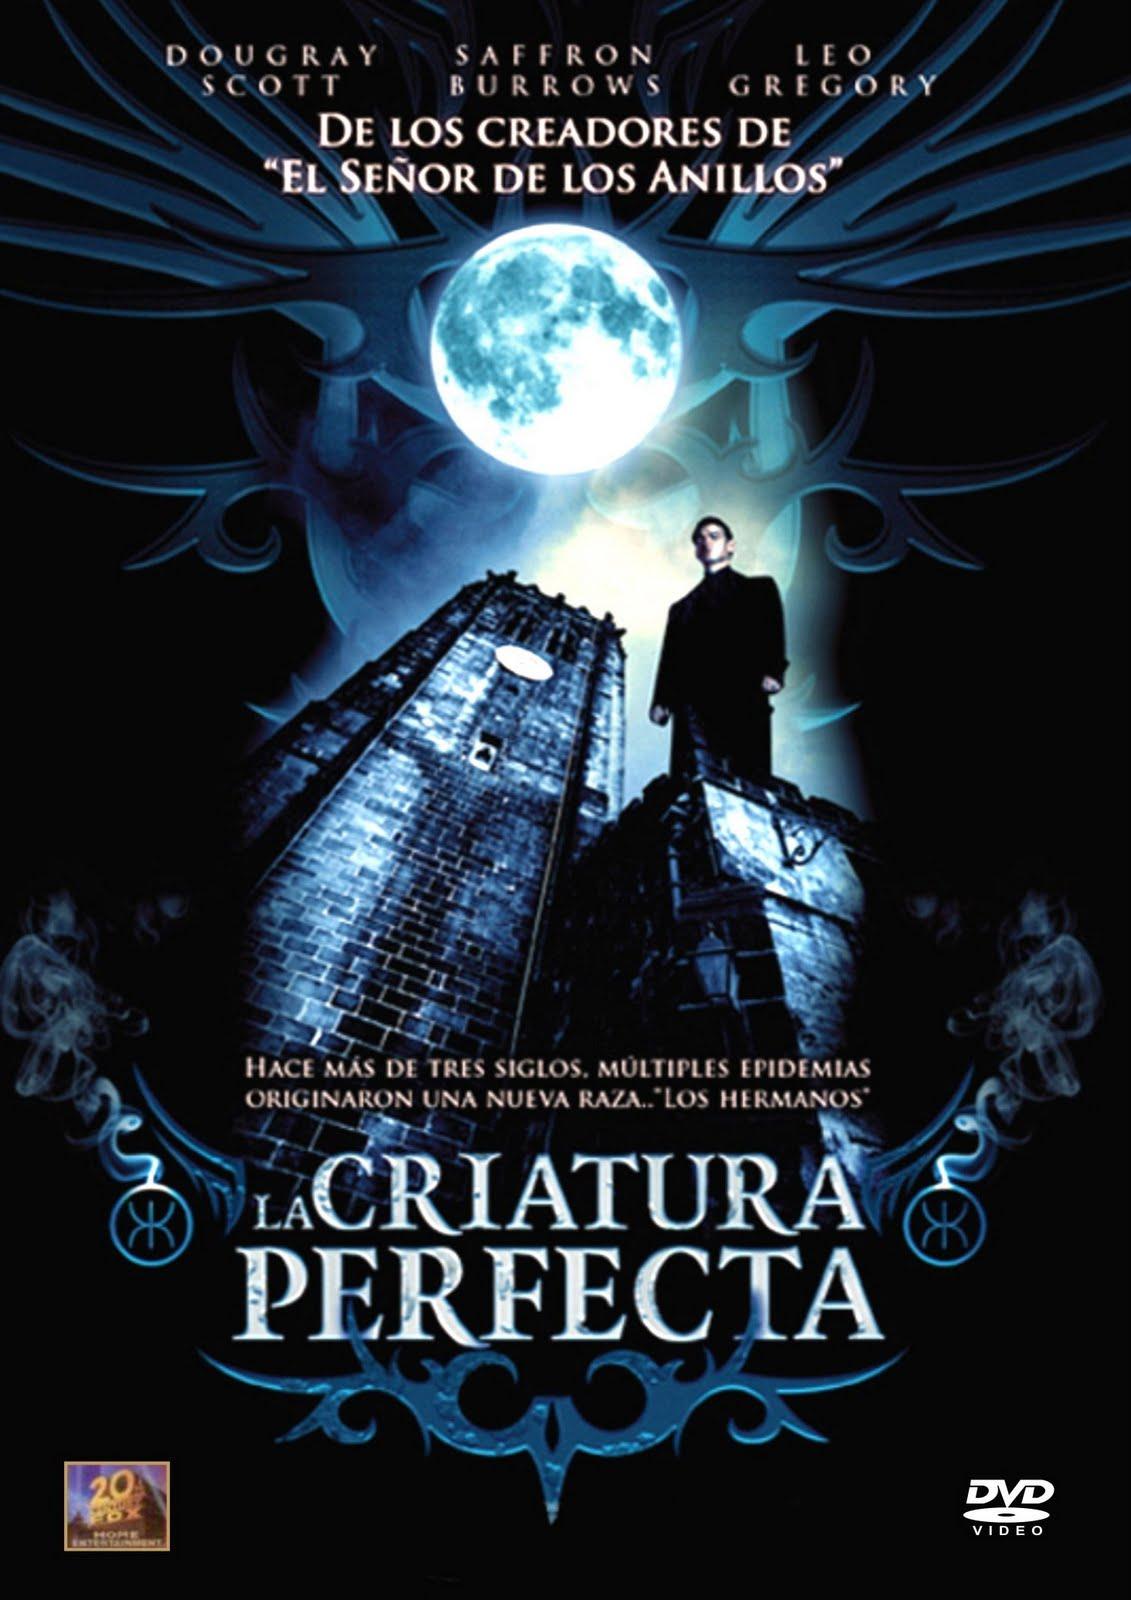 La Criatura Perfecta (2006)